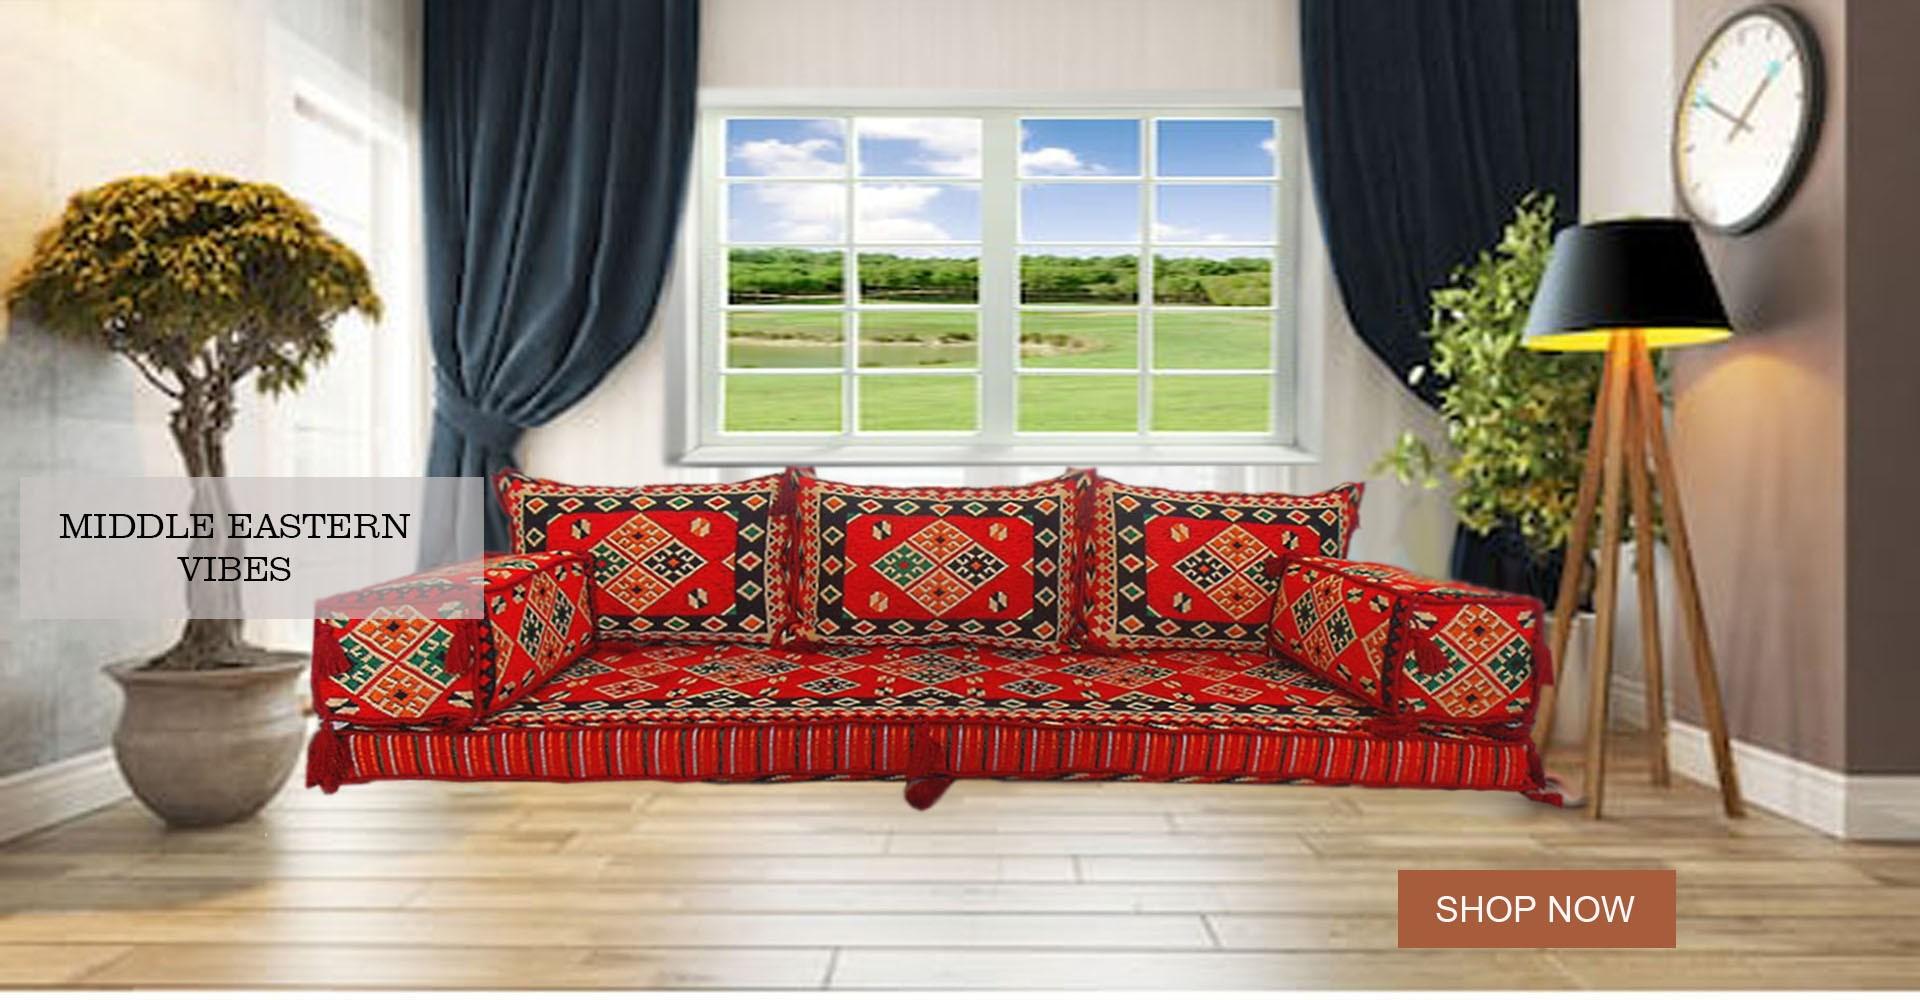 Floor sofas